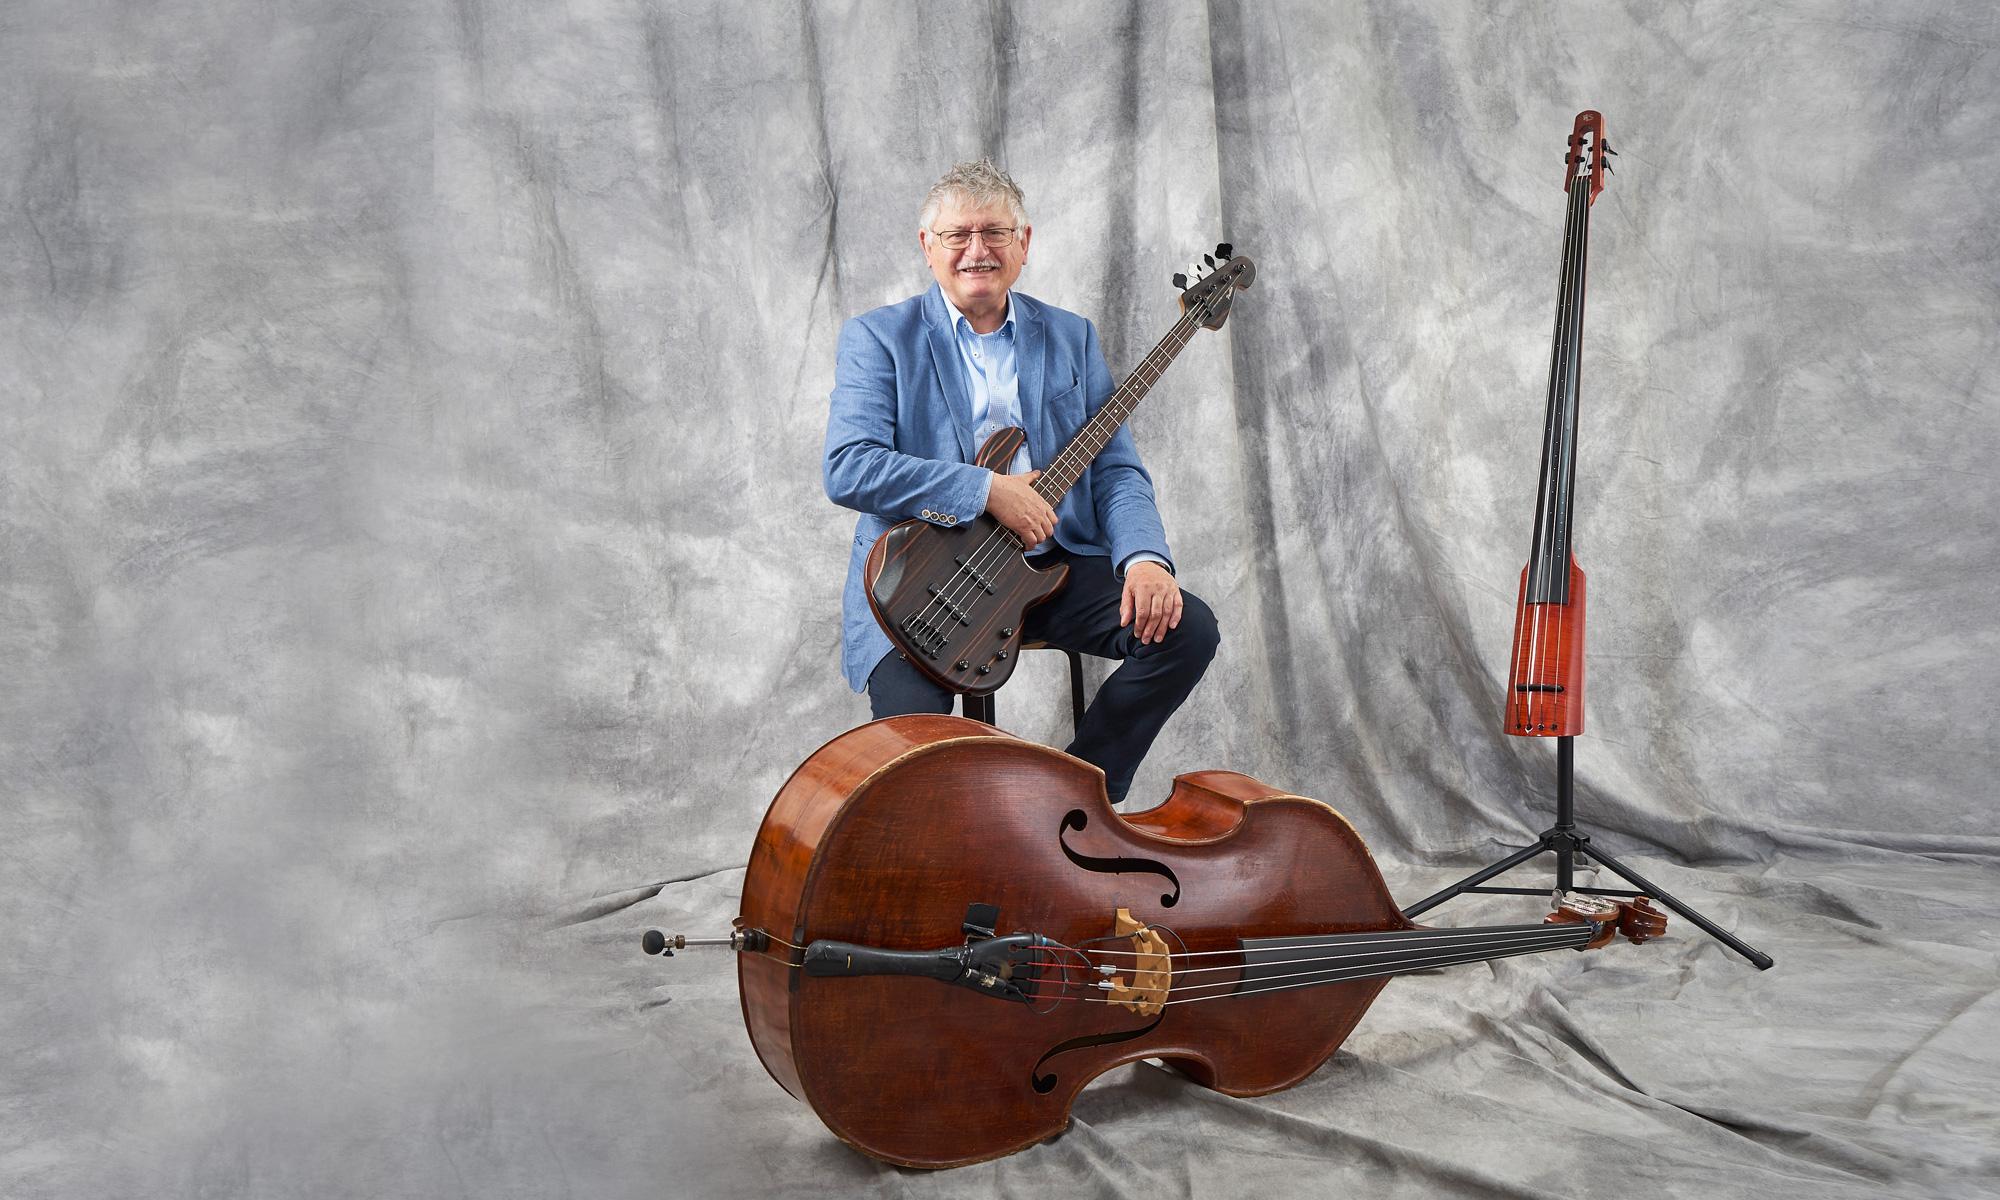 Otto Bauknecht